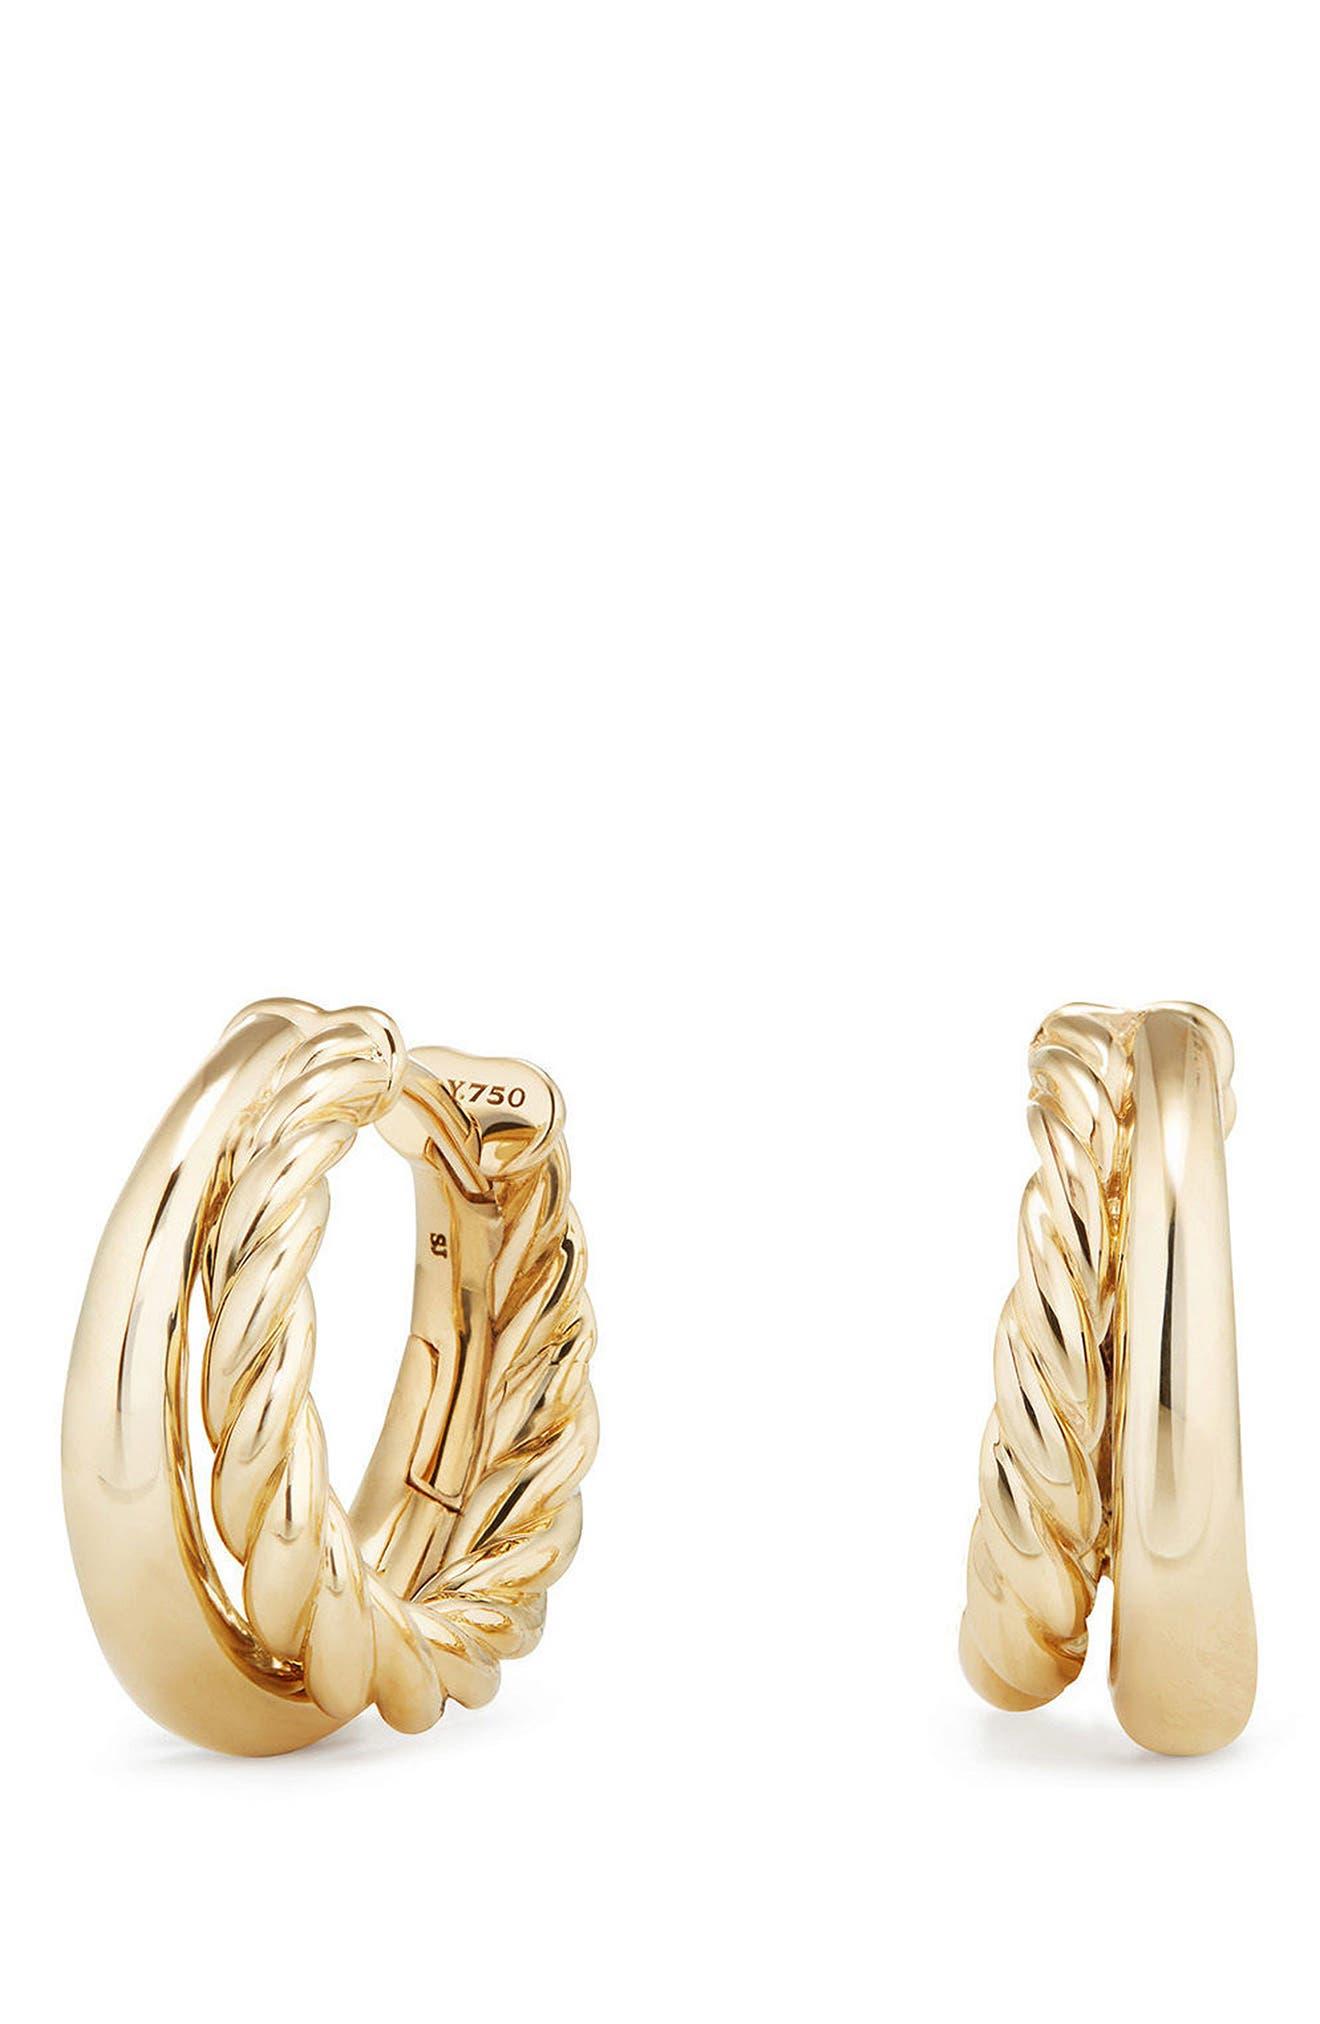 Alternate Image 1 Selected - David Yurman Pure Form Hoop Earrings in 18K Gold, 12mm